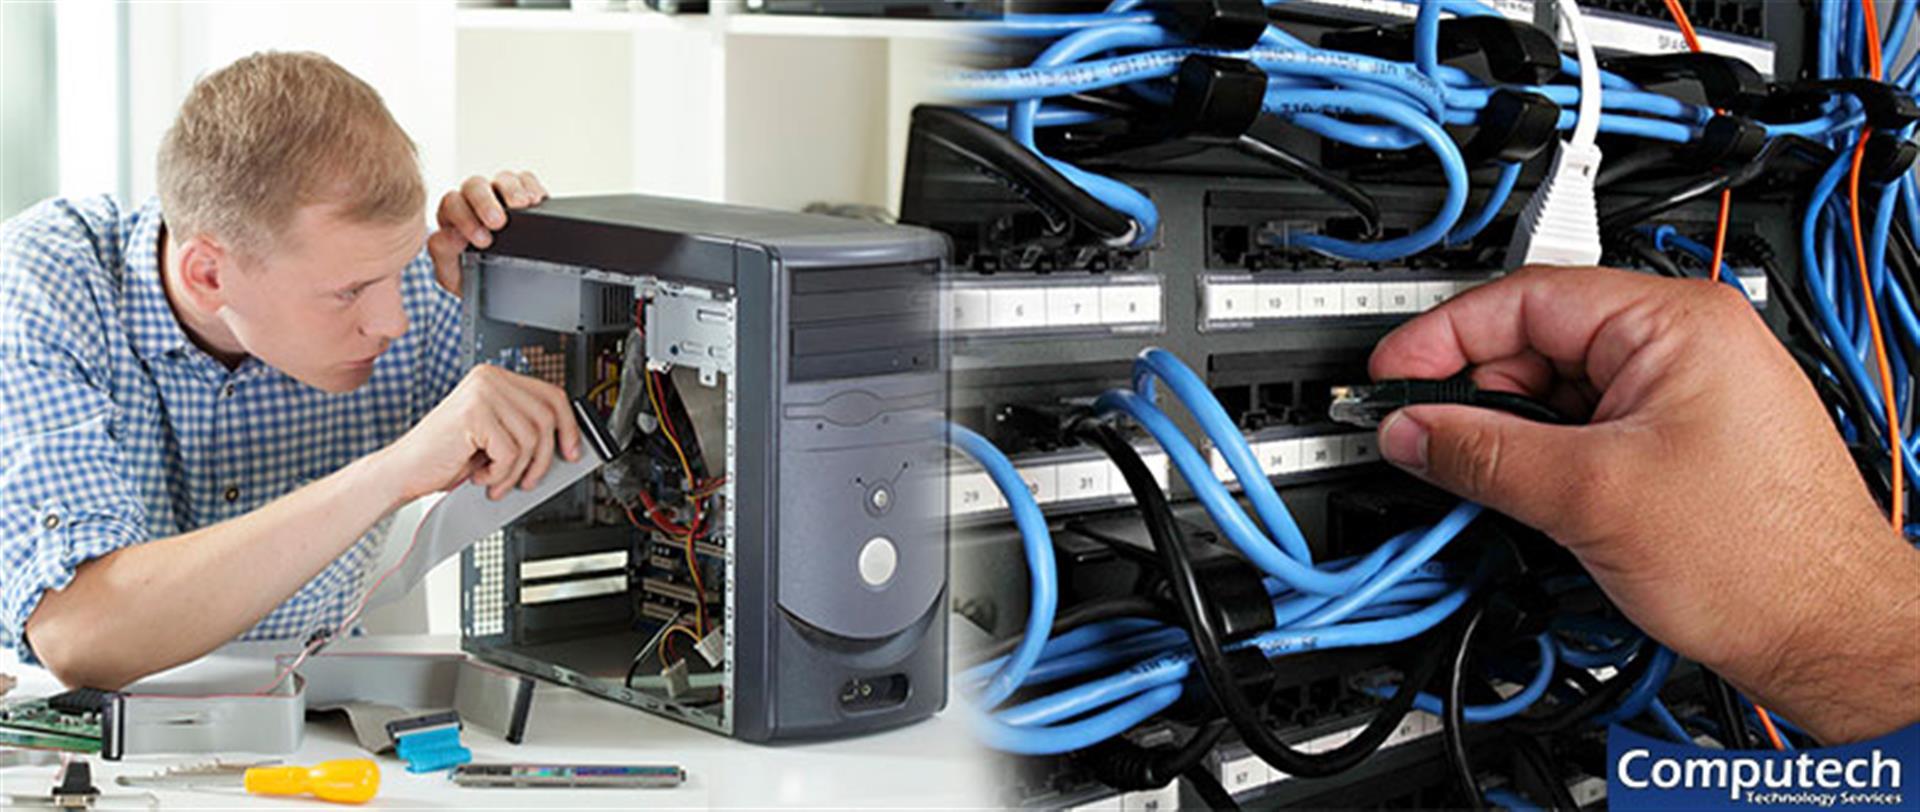 Manassas Virginia Onsite PC & Printer Repair, Networking, Voice & Data Cabling Contractors